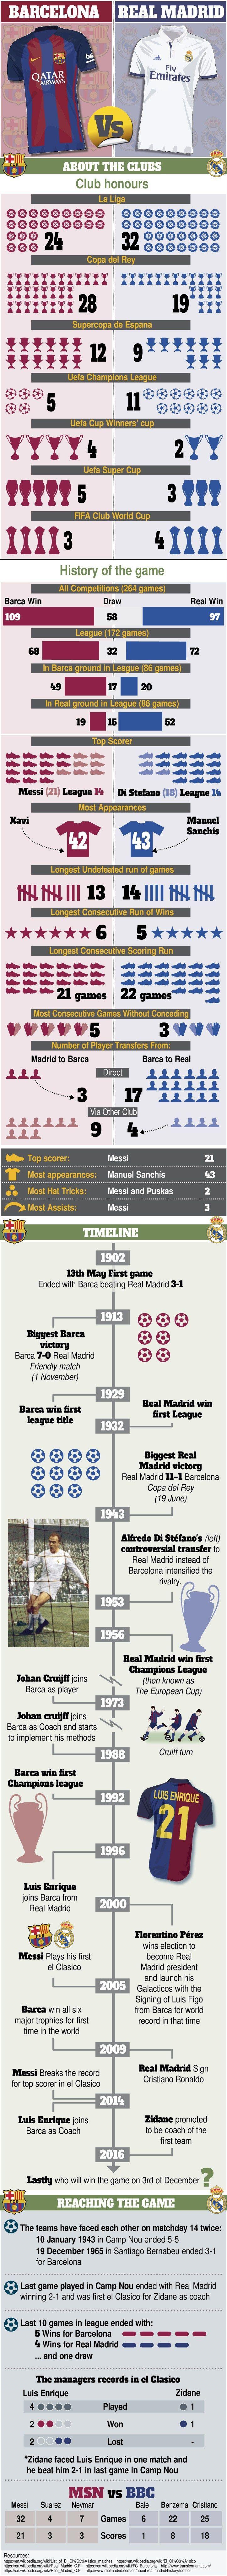 infographic: El Clasico Barcelona vs Real Madrid